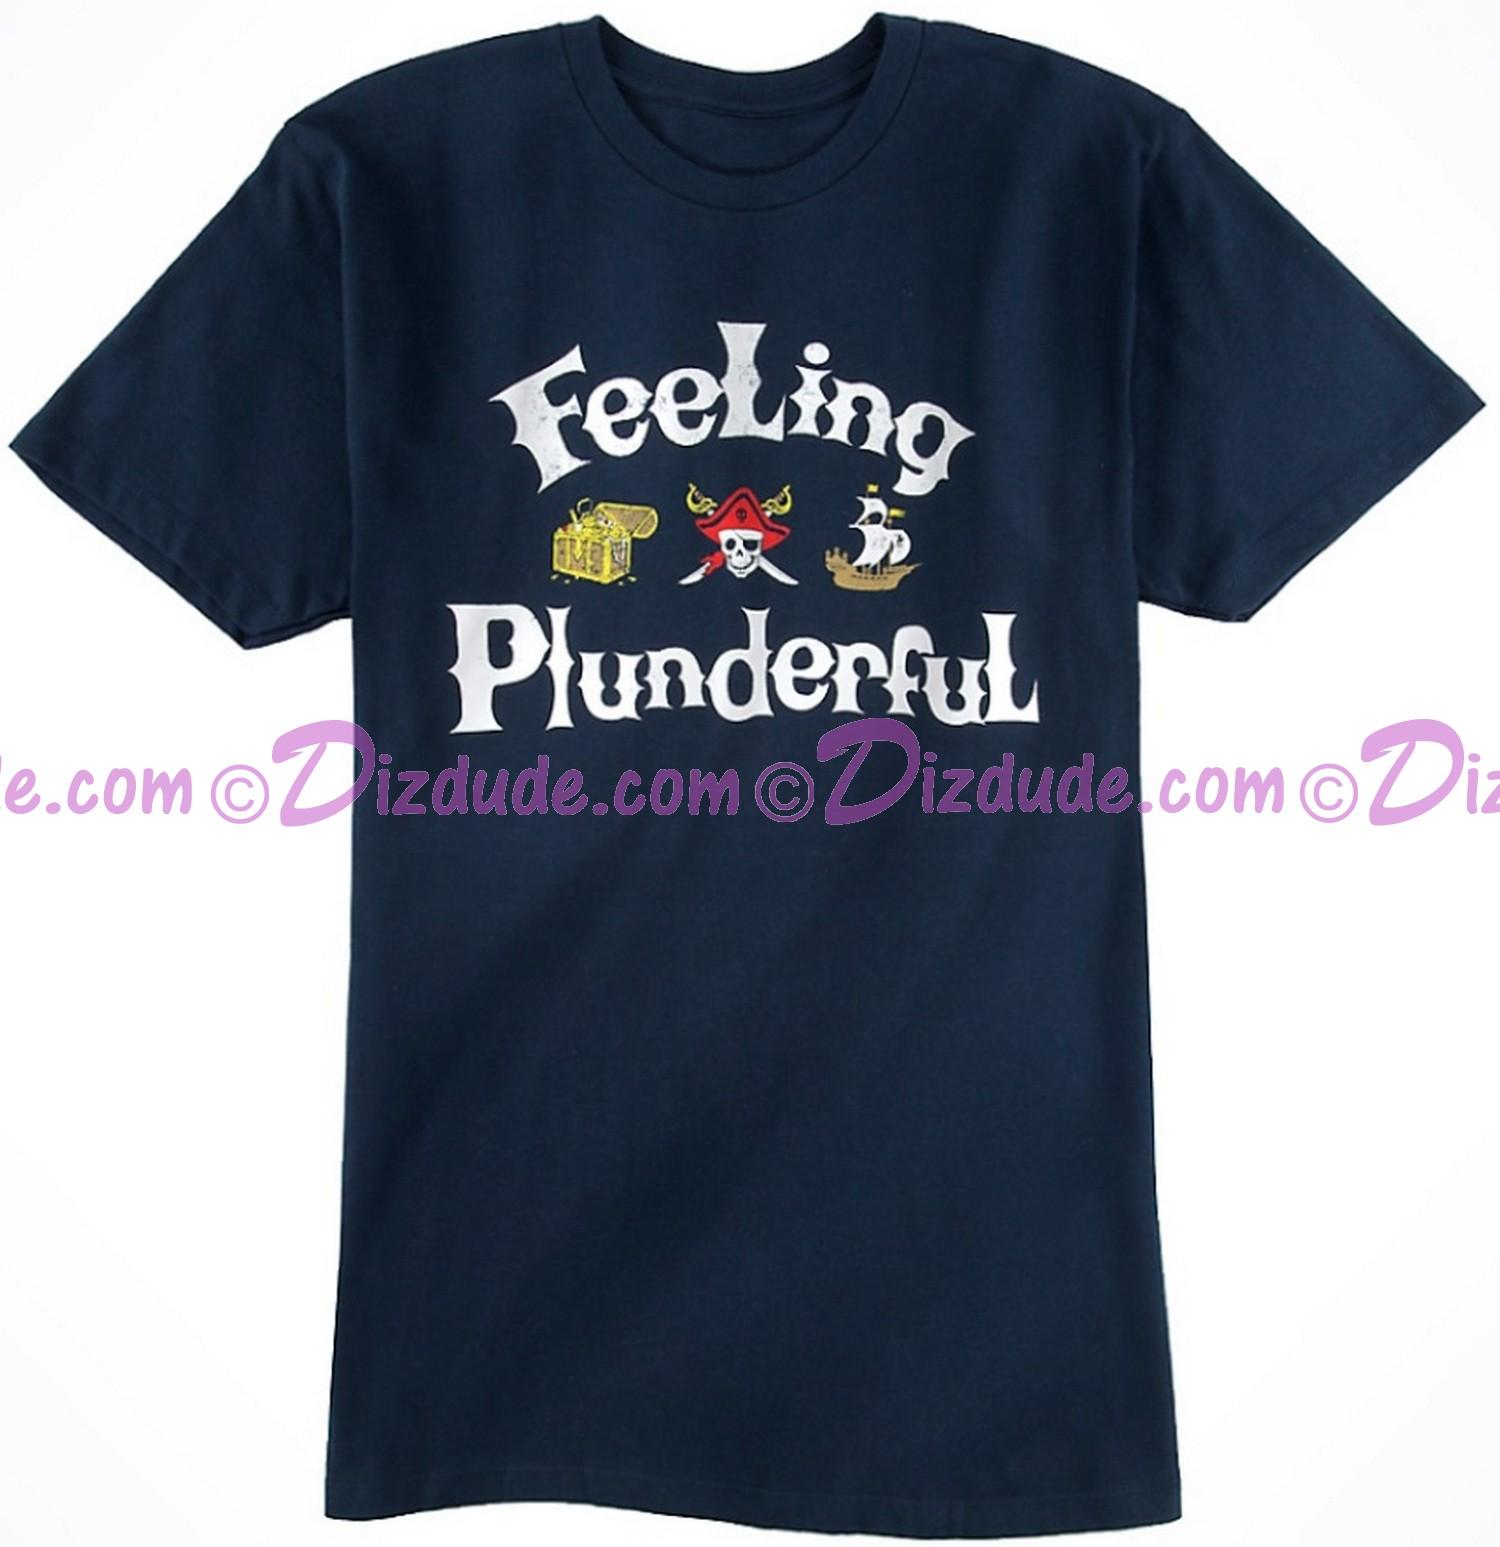 Vintage Disney Pirate Feeling Plunderful Adult T-shirt (Tee, Tshirt or T shirt)